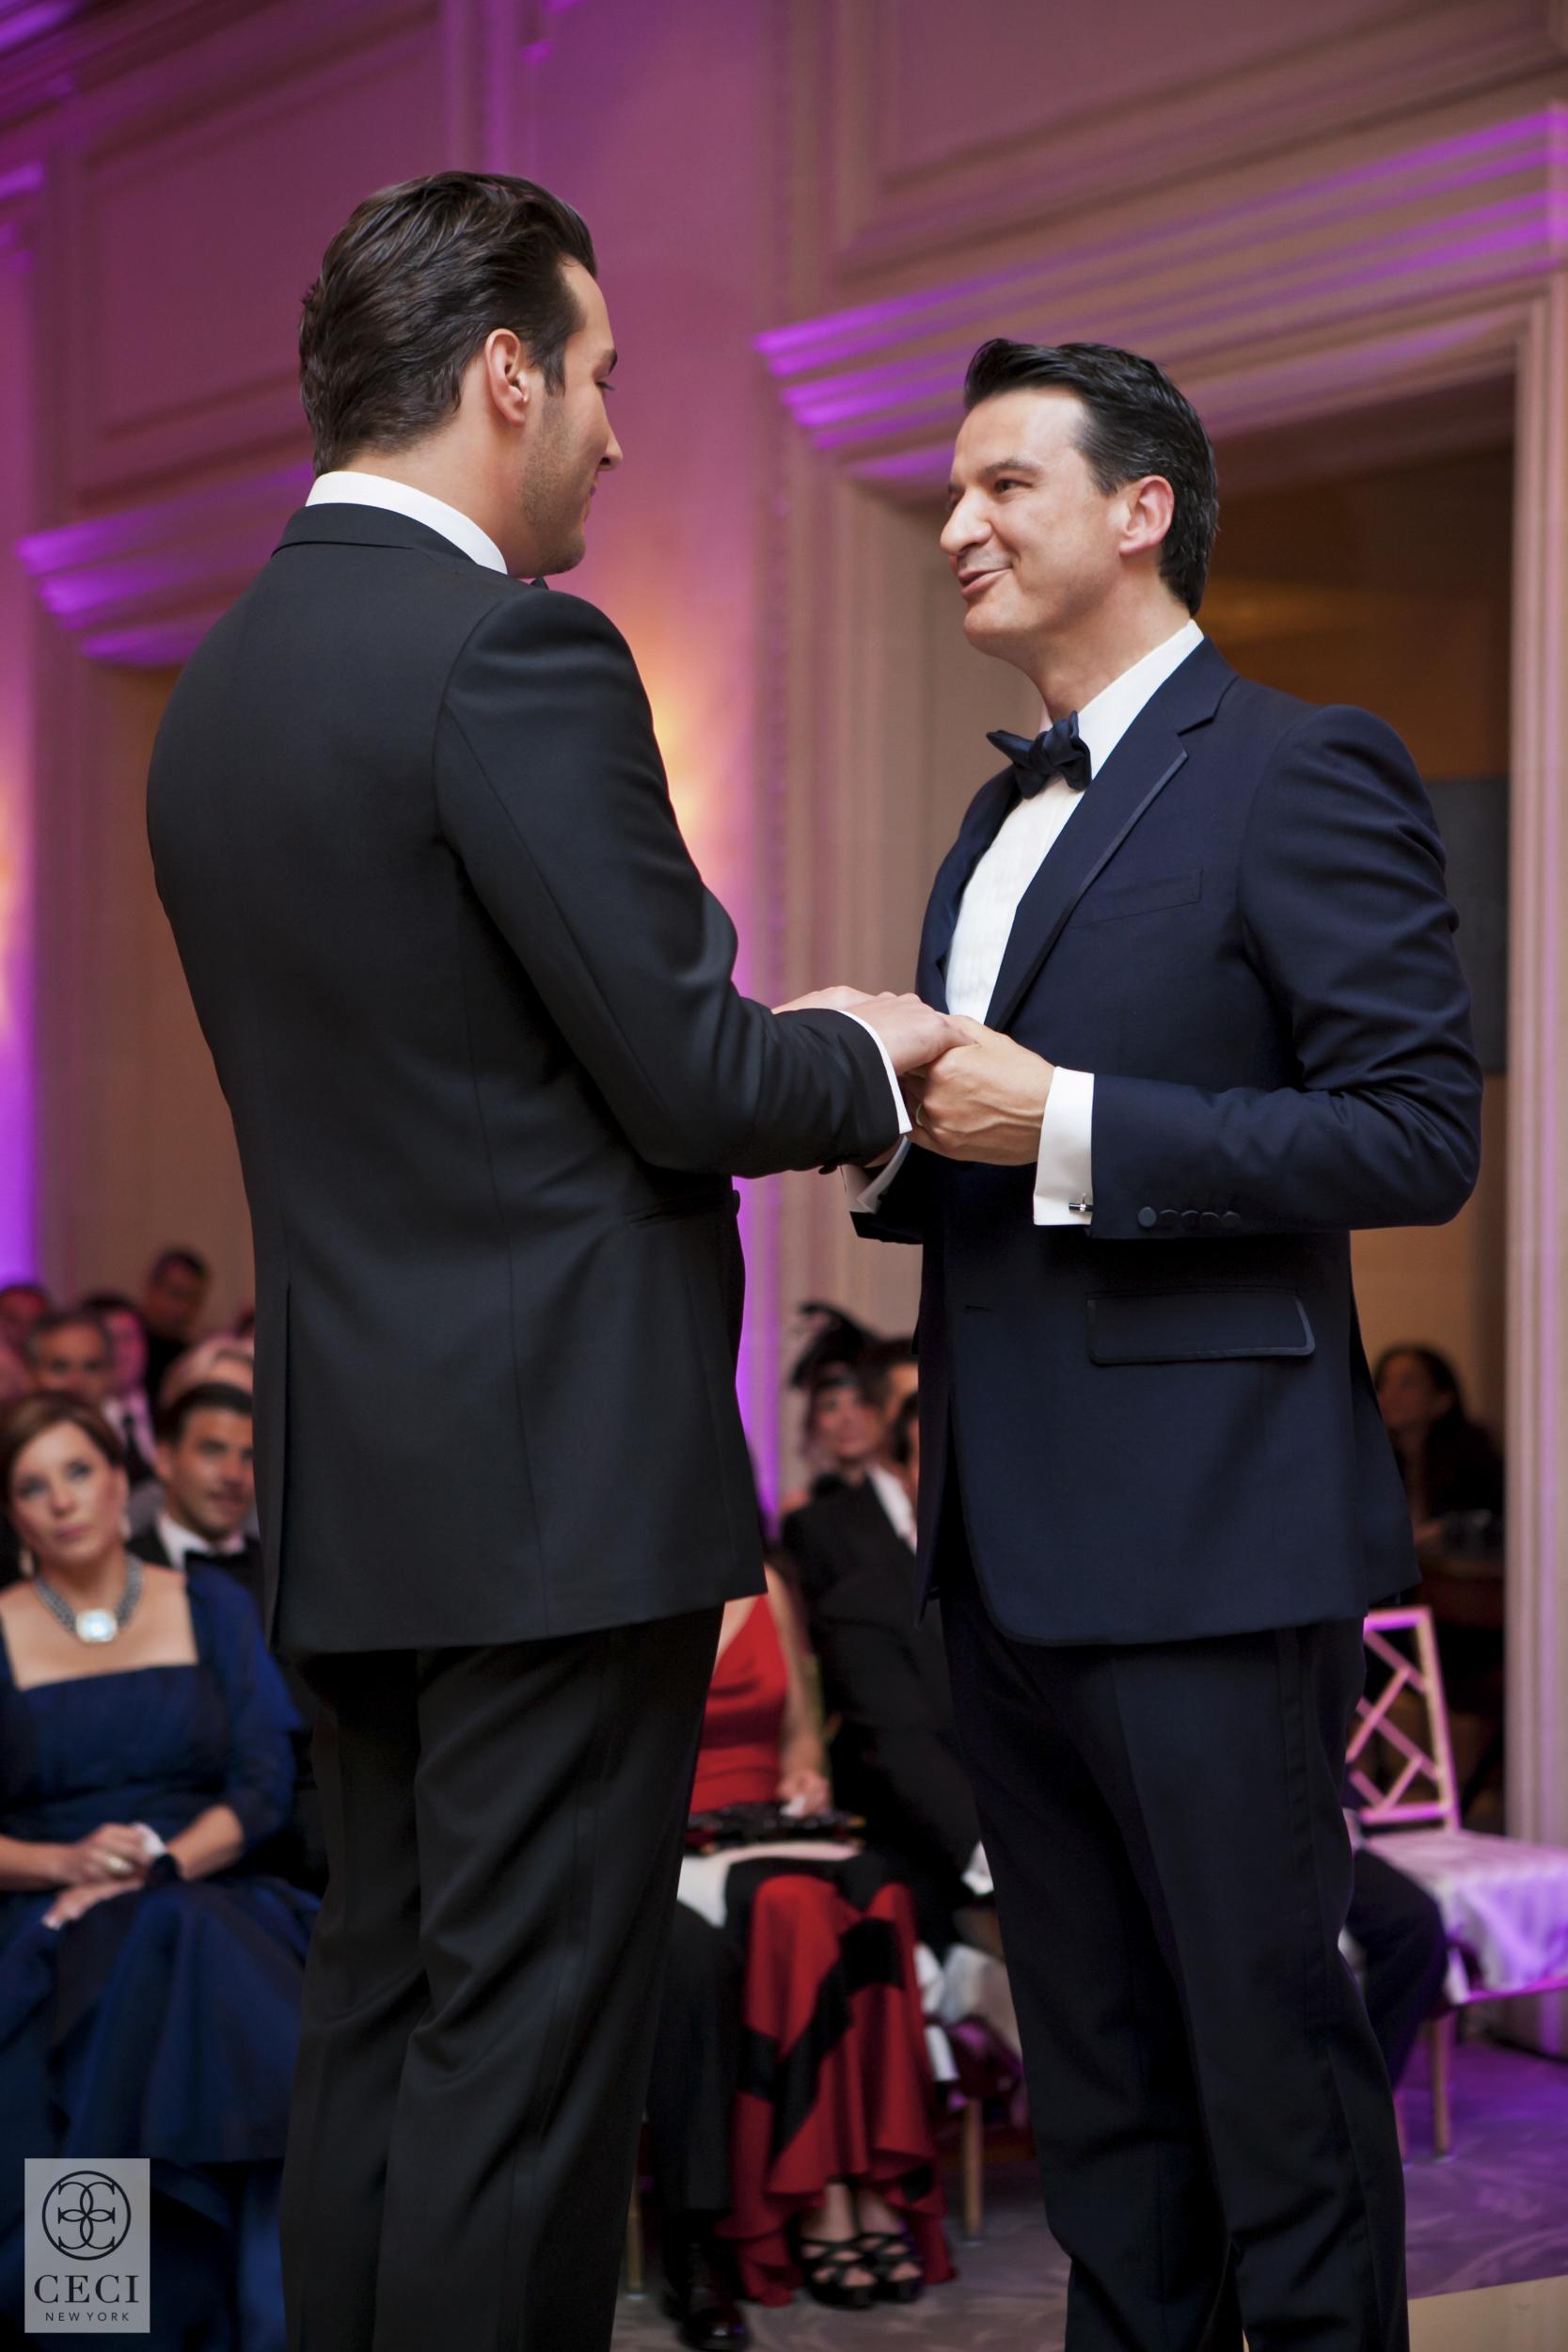 ceci_new_york_lucas_somoza_purple_regal_wediding_birthday_commitment_ceremony_gold-7.jpg